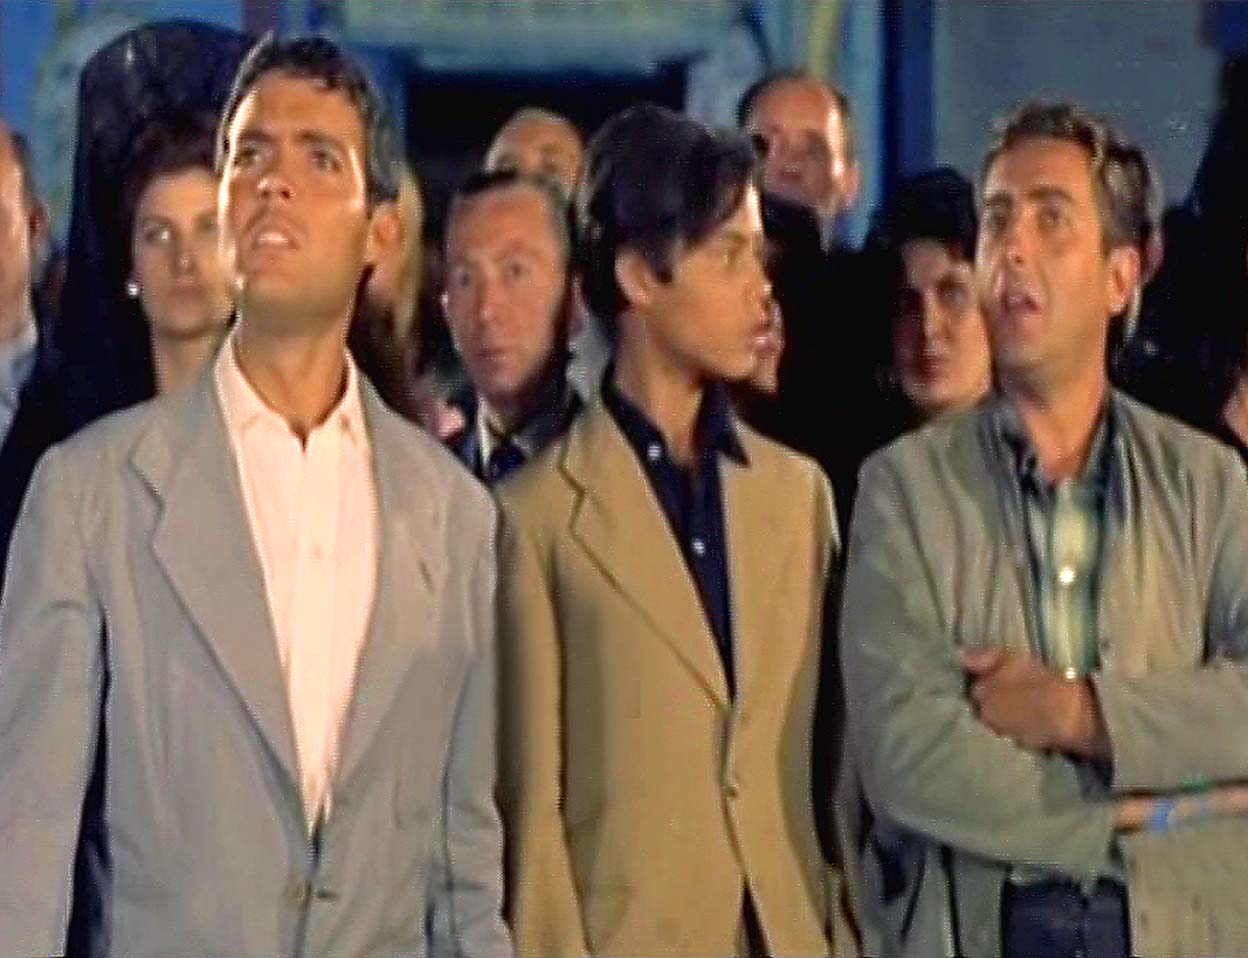 Pedrito Rico, Juan Salazar, and Ángel Ter in Feria en Sevilla (1962)